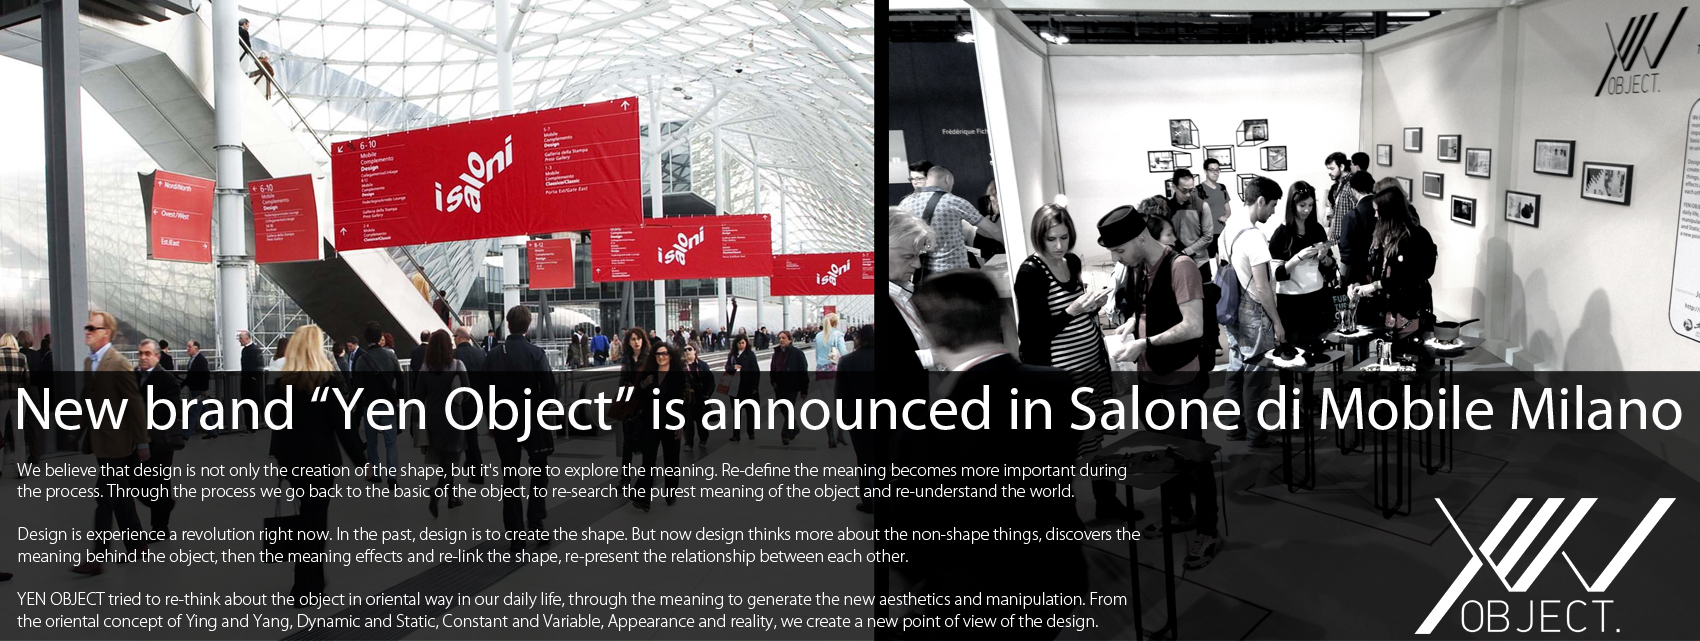 salone di Mobile,米蘭家具展。Yen Object 衍物首次發表。